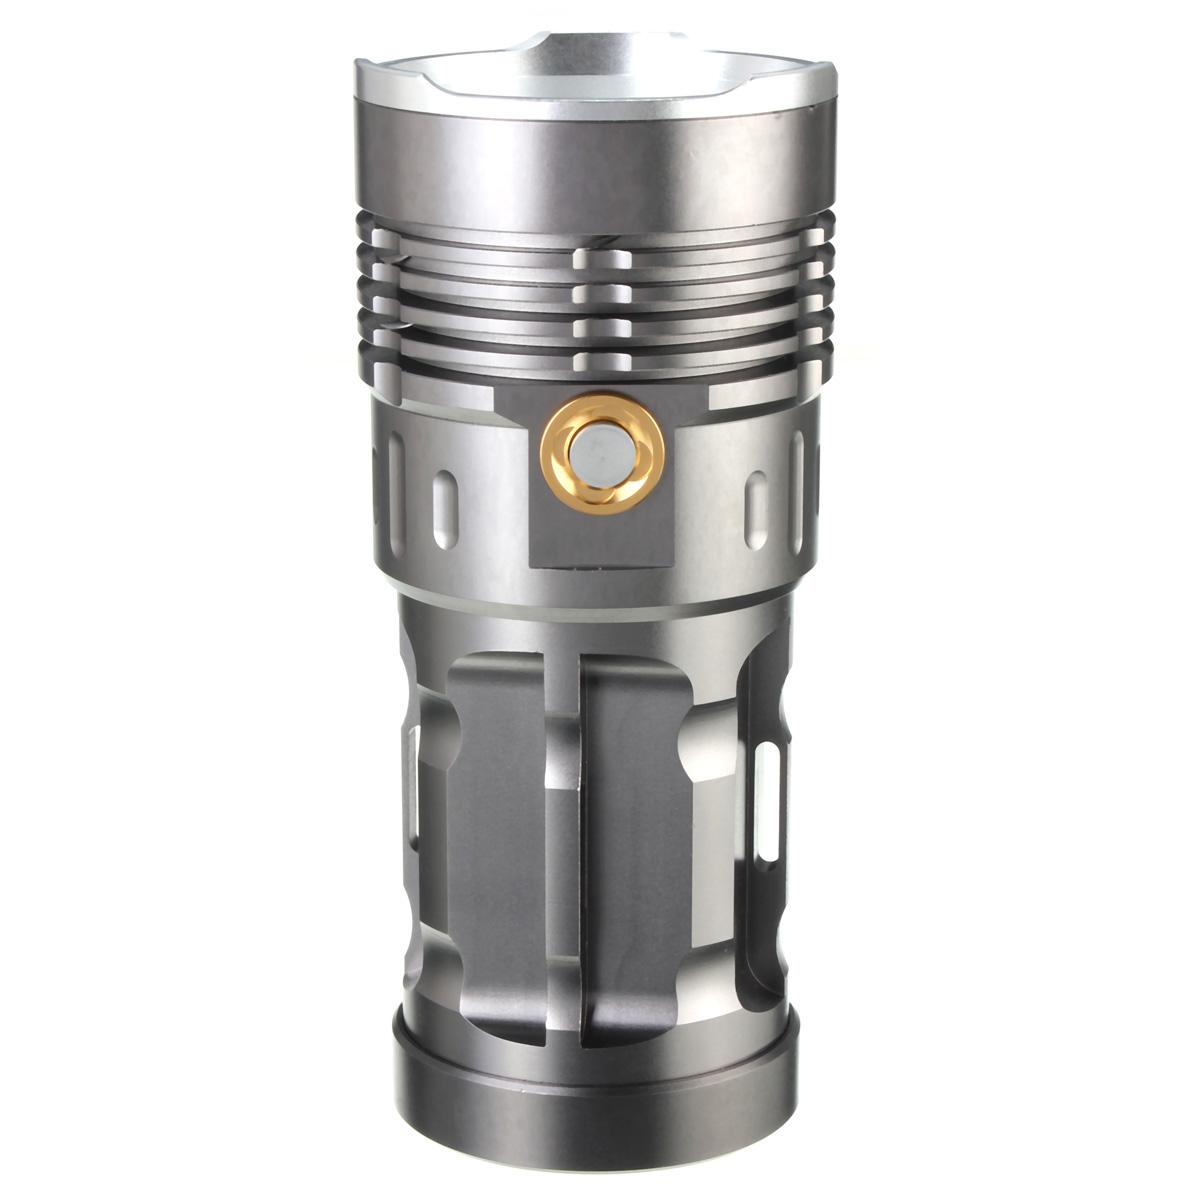 waterproof skyray 10000 lumen 7x xm l2 t6 led flashlight torch light ebay. Black Bedroom Furniture Sets. Home Design Ideas